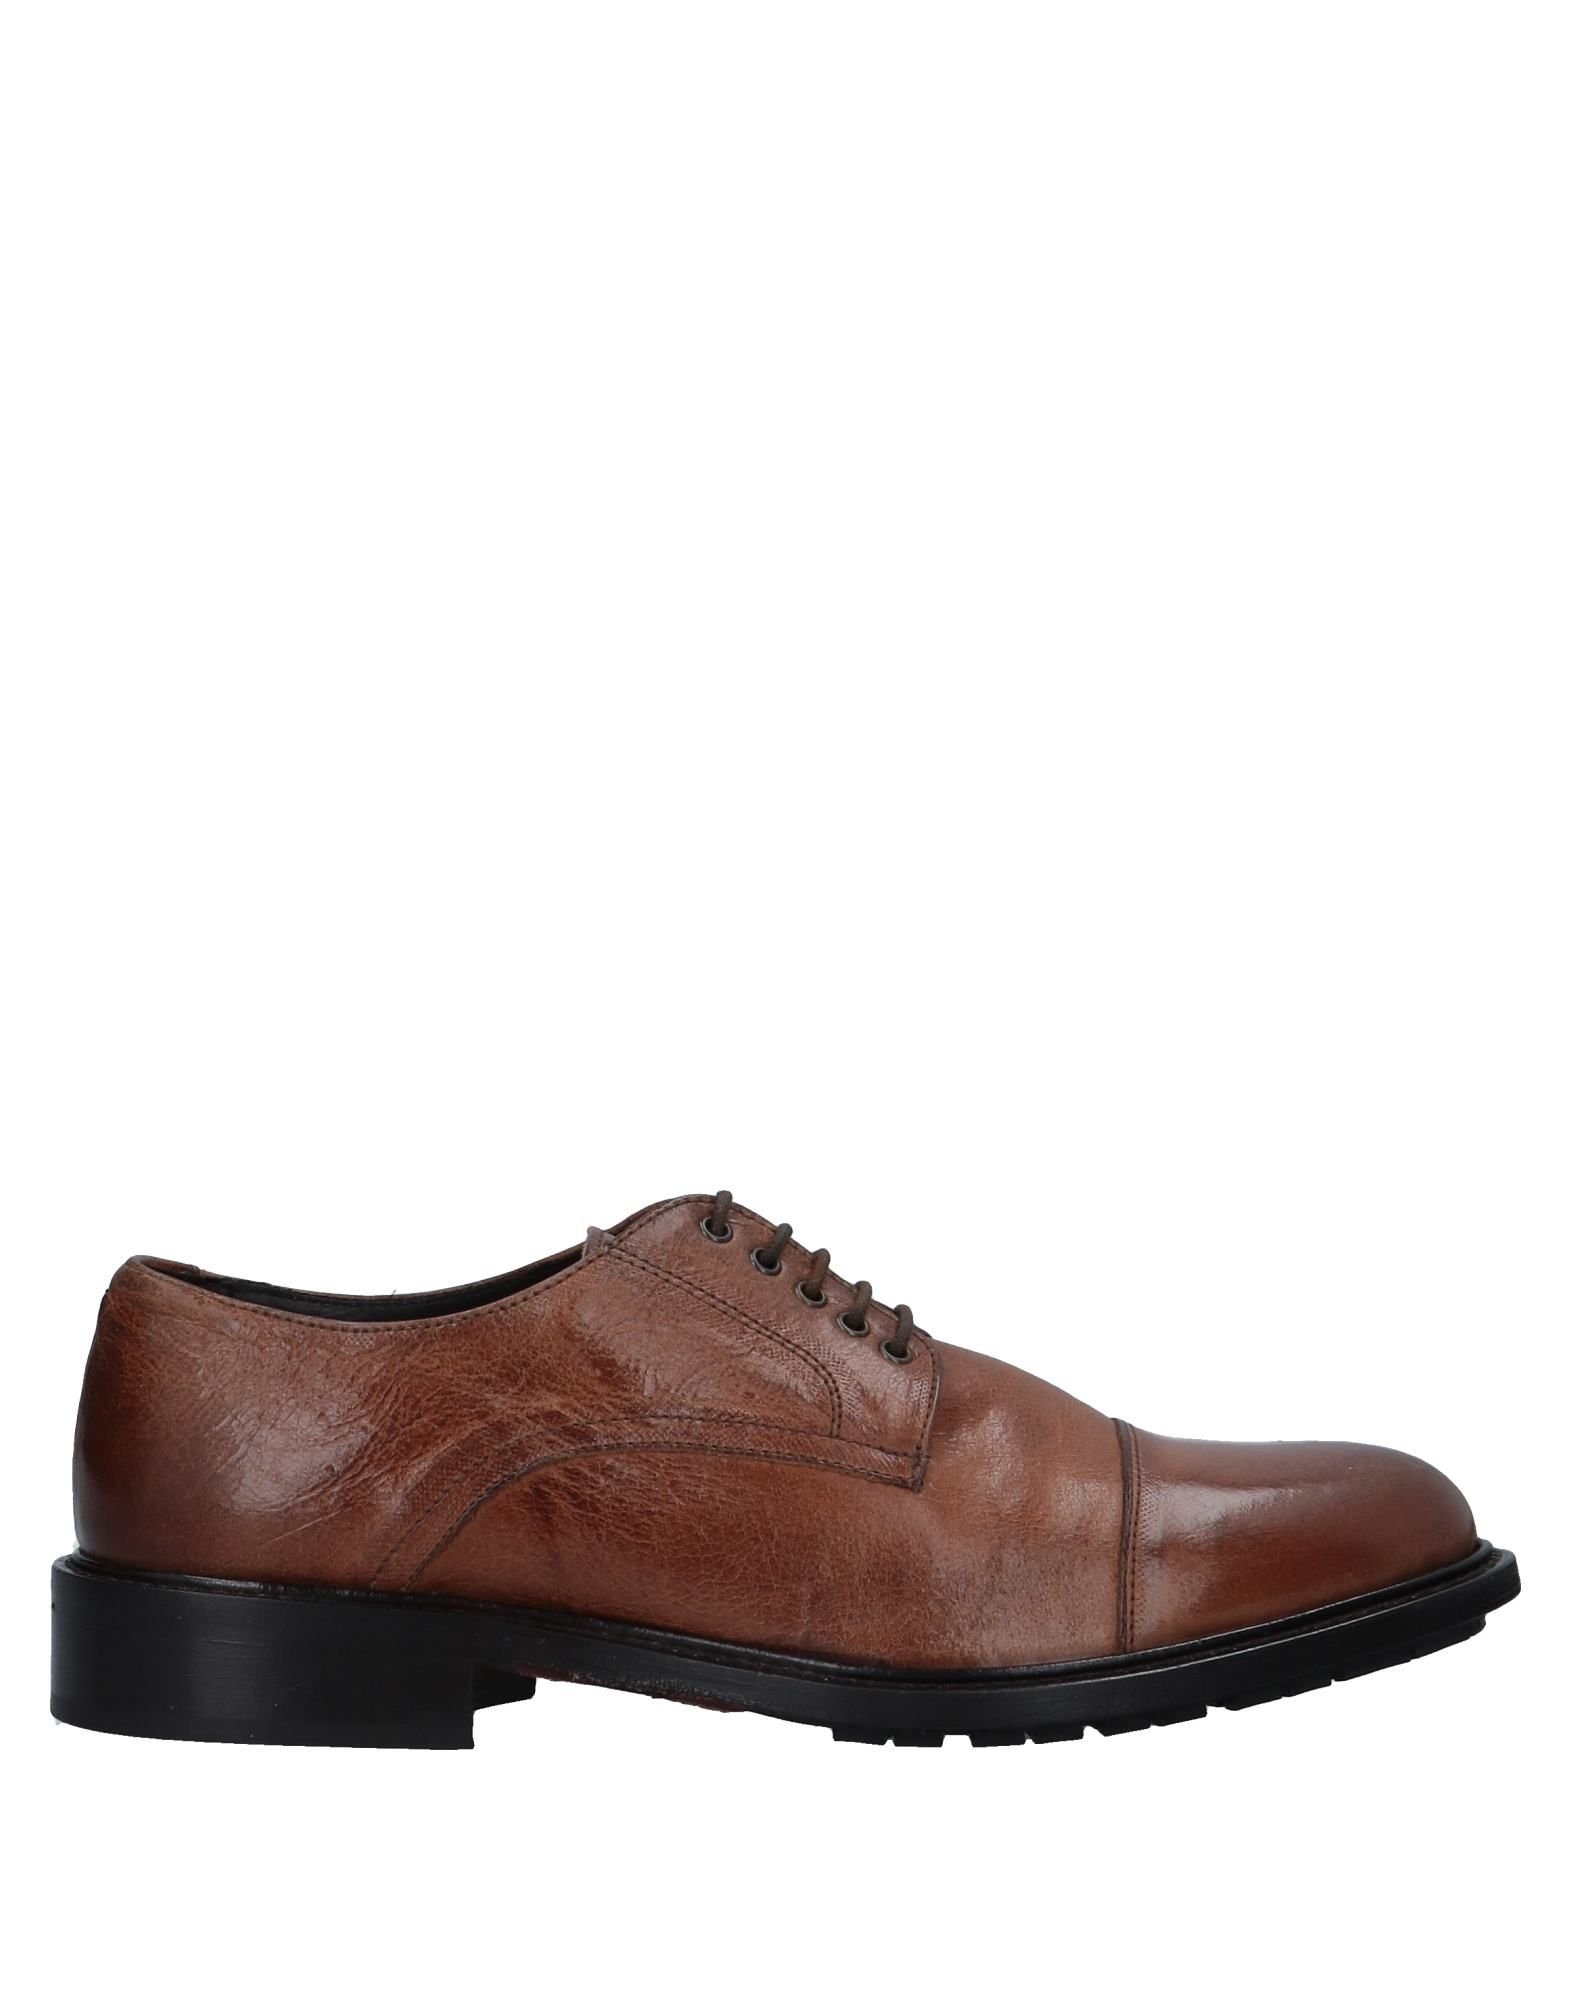 Wiskey Heiße Schnürschuhe Herren  11543466WR Heiße Wiskey Schuhe da7cb7